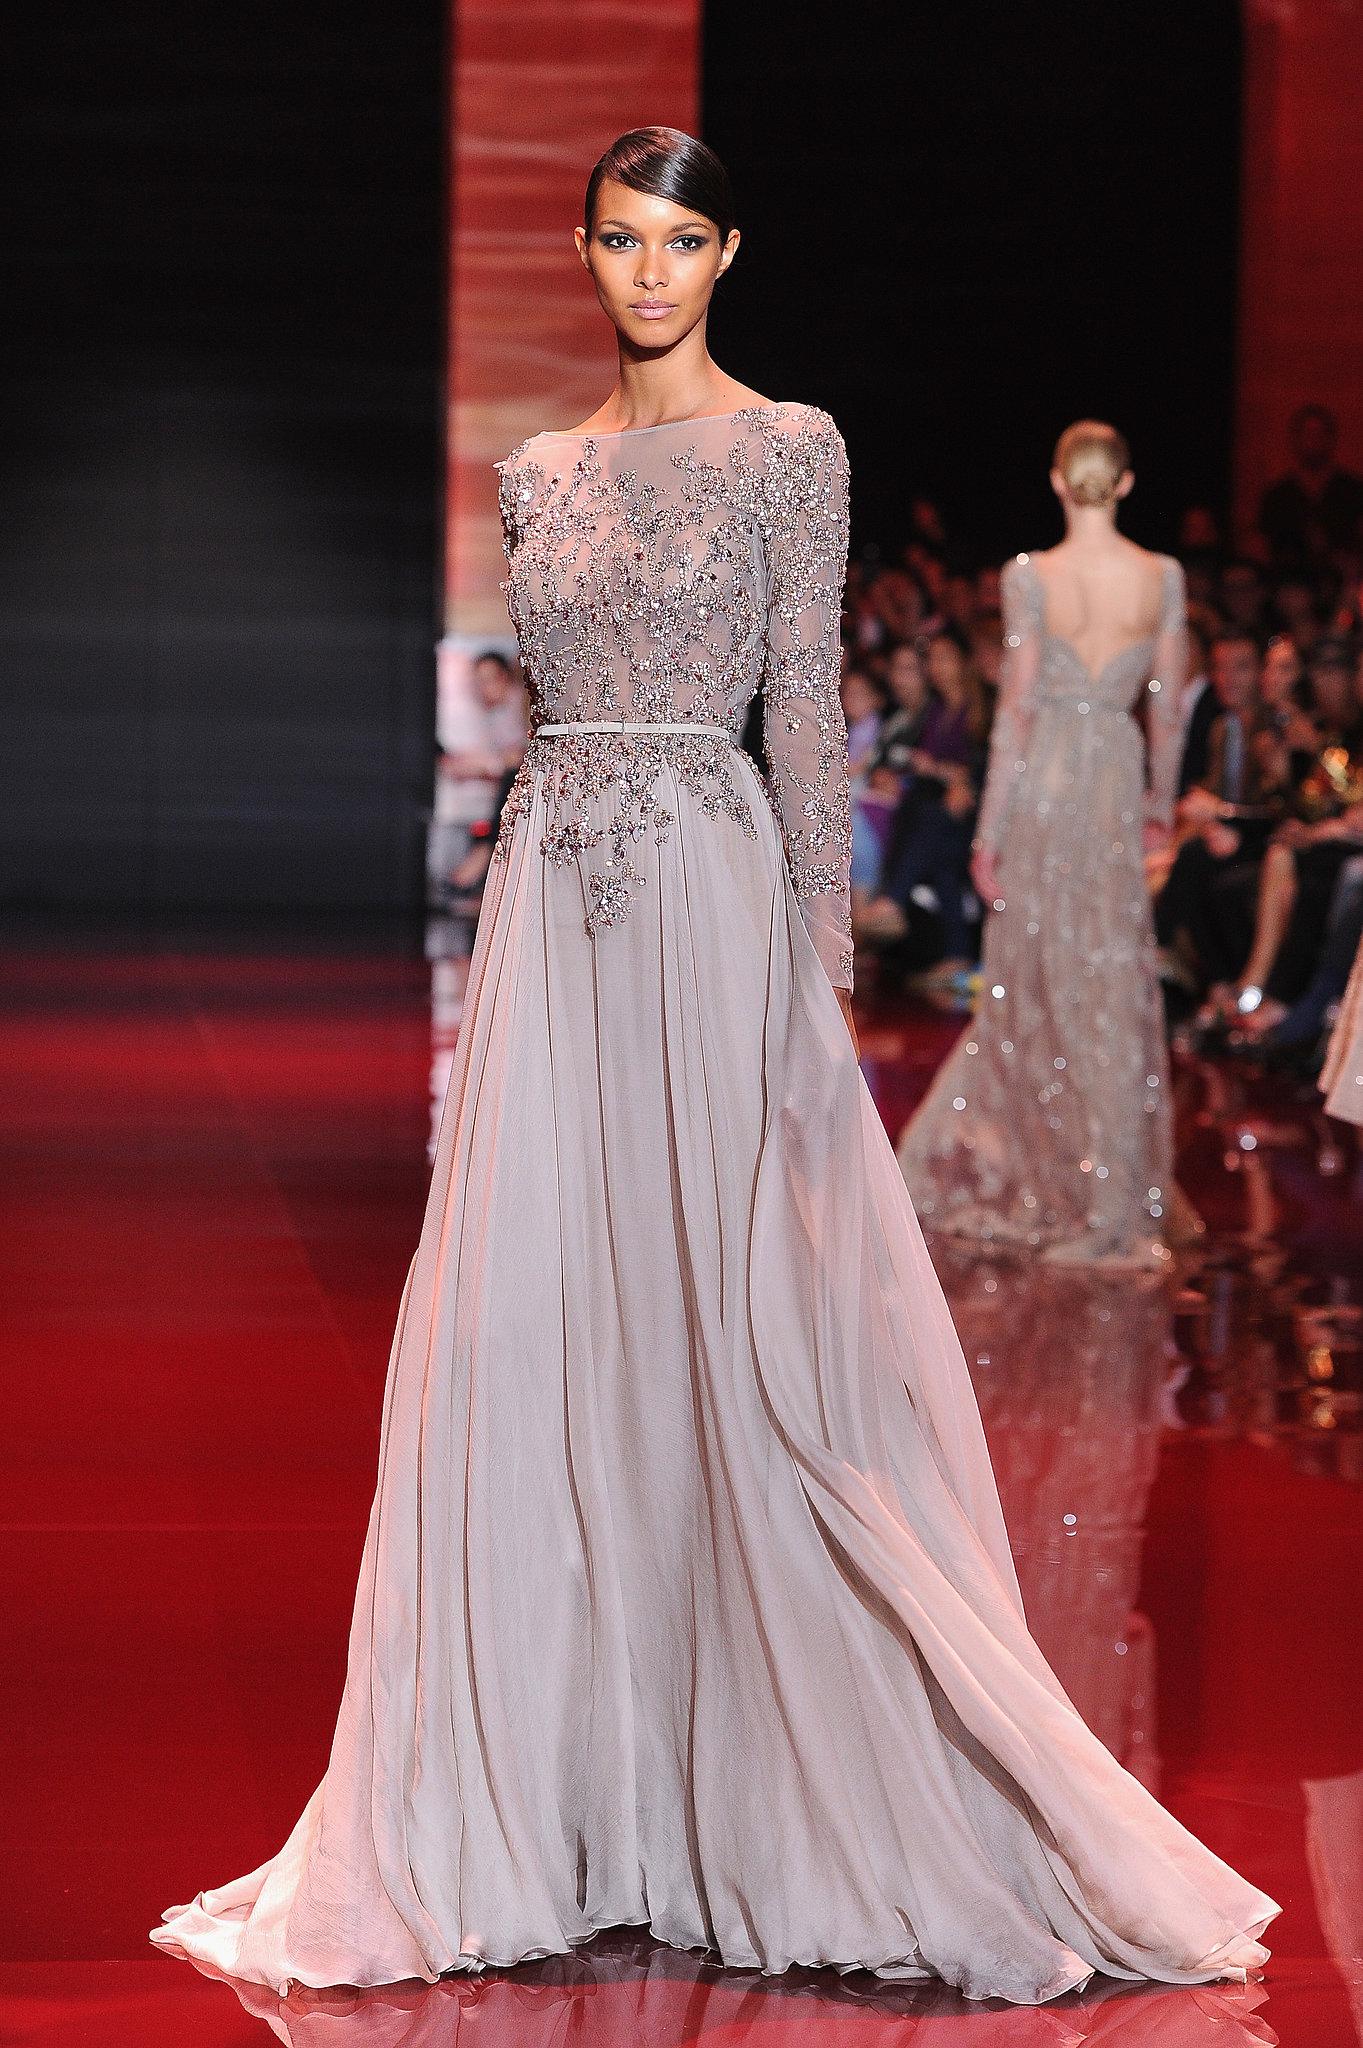 Elie Saab Haute Couture Fall 2013